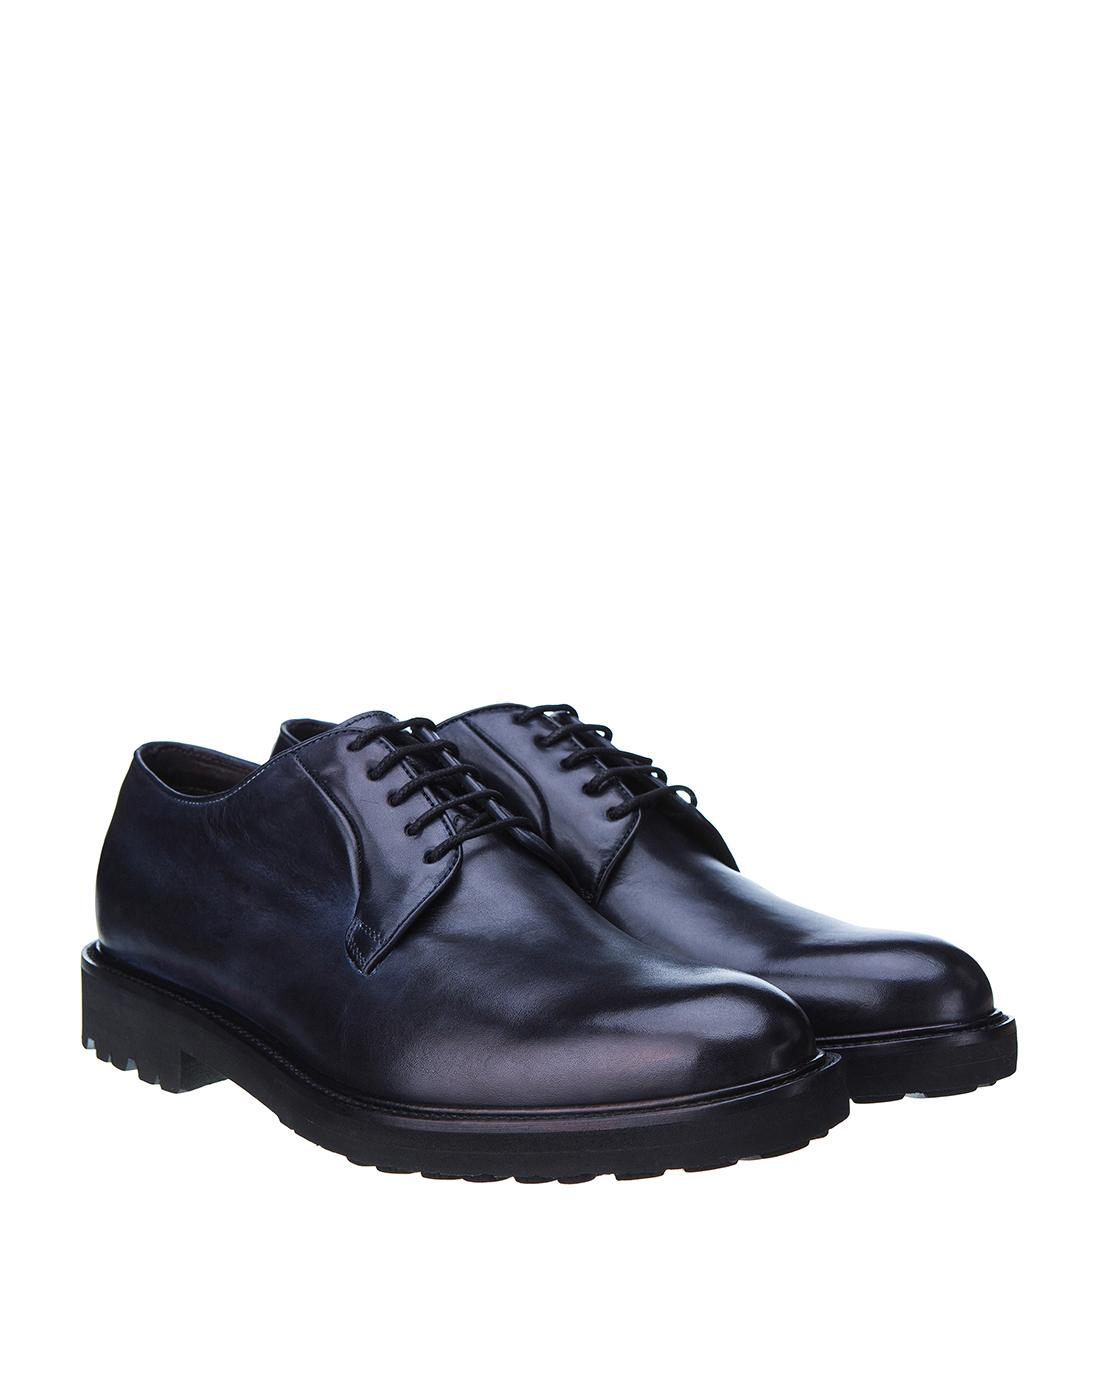 Туфли синие мужские Brecos S8066-2